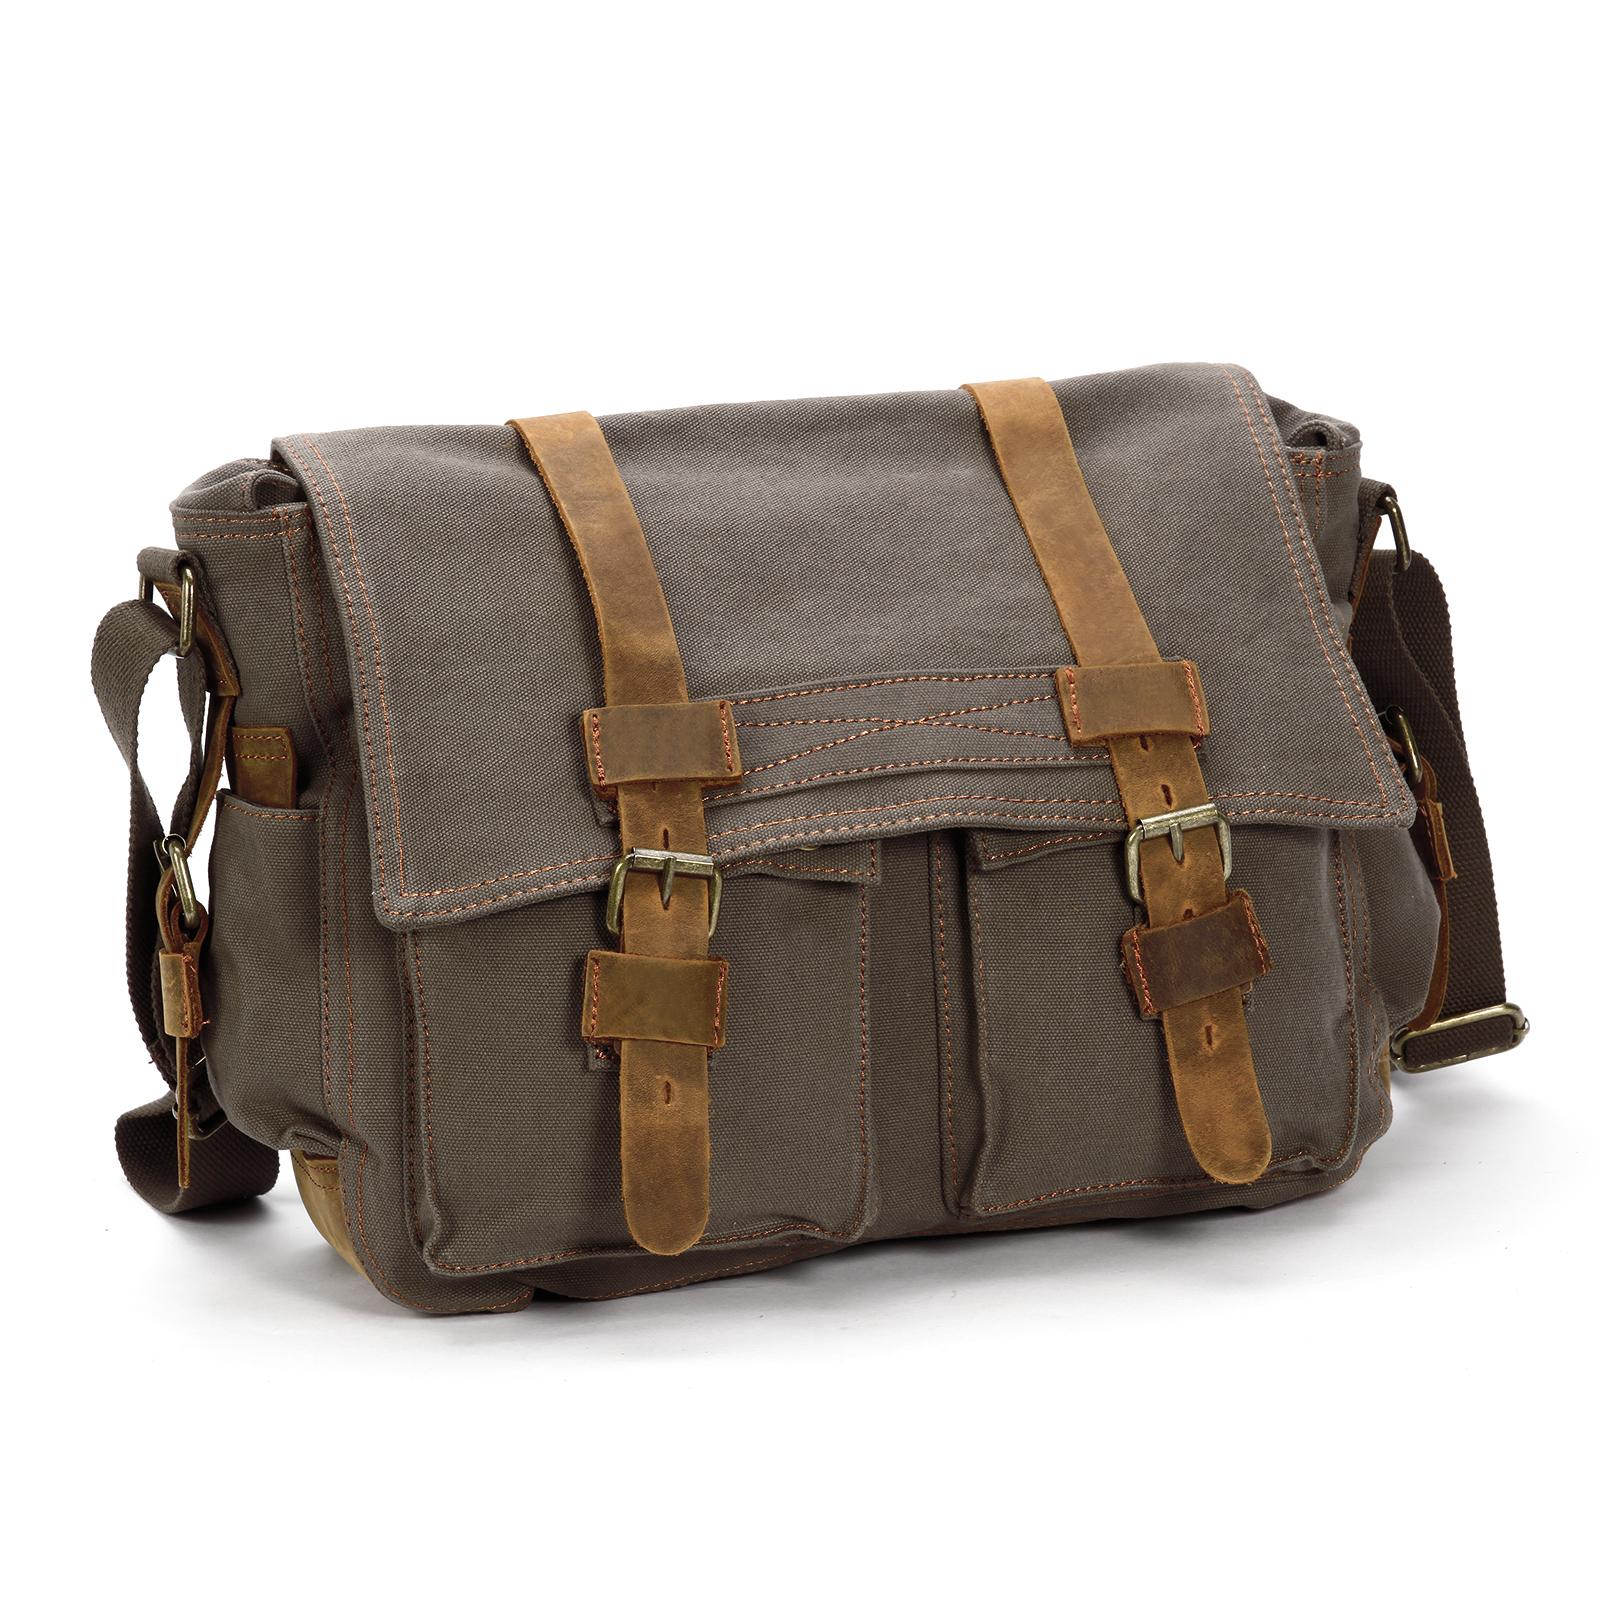 herren canvas rucksack schultertasche messenger bag umh ngetasche sport tasche ebay. Black Bedroom Furniture Sets. Home Design Ideas